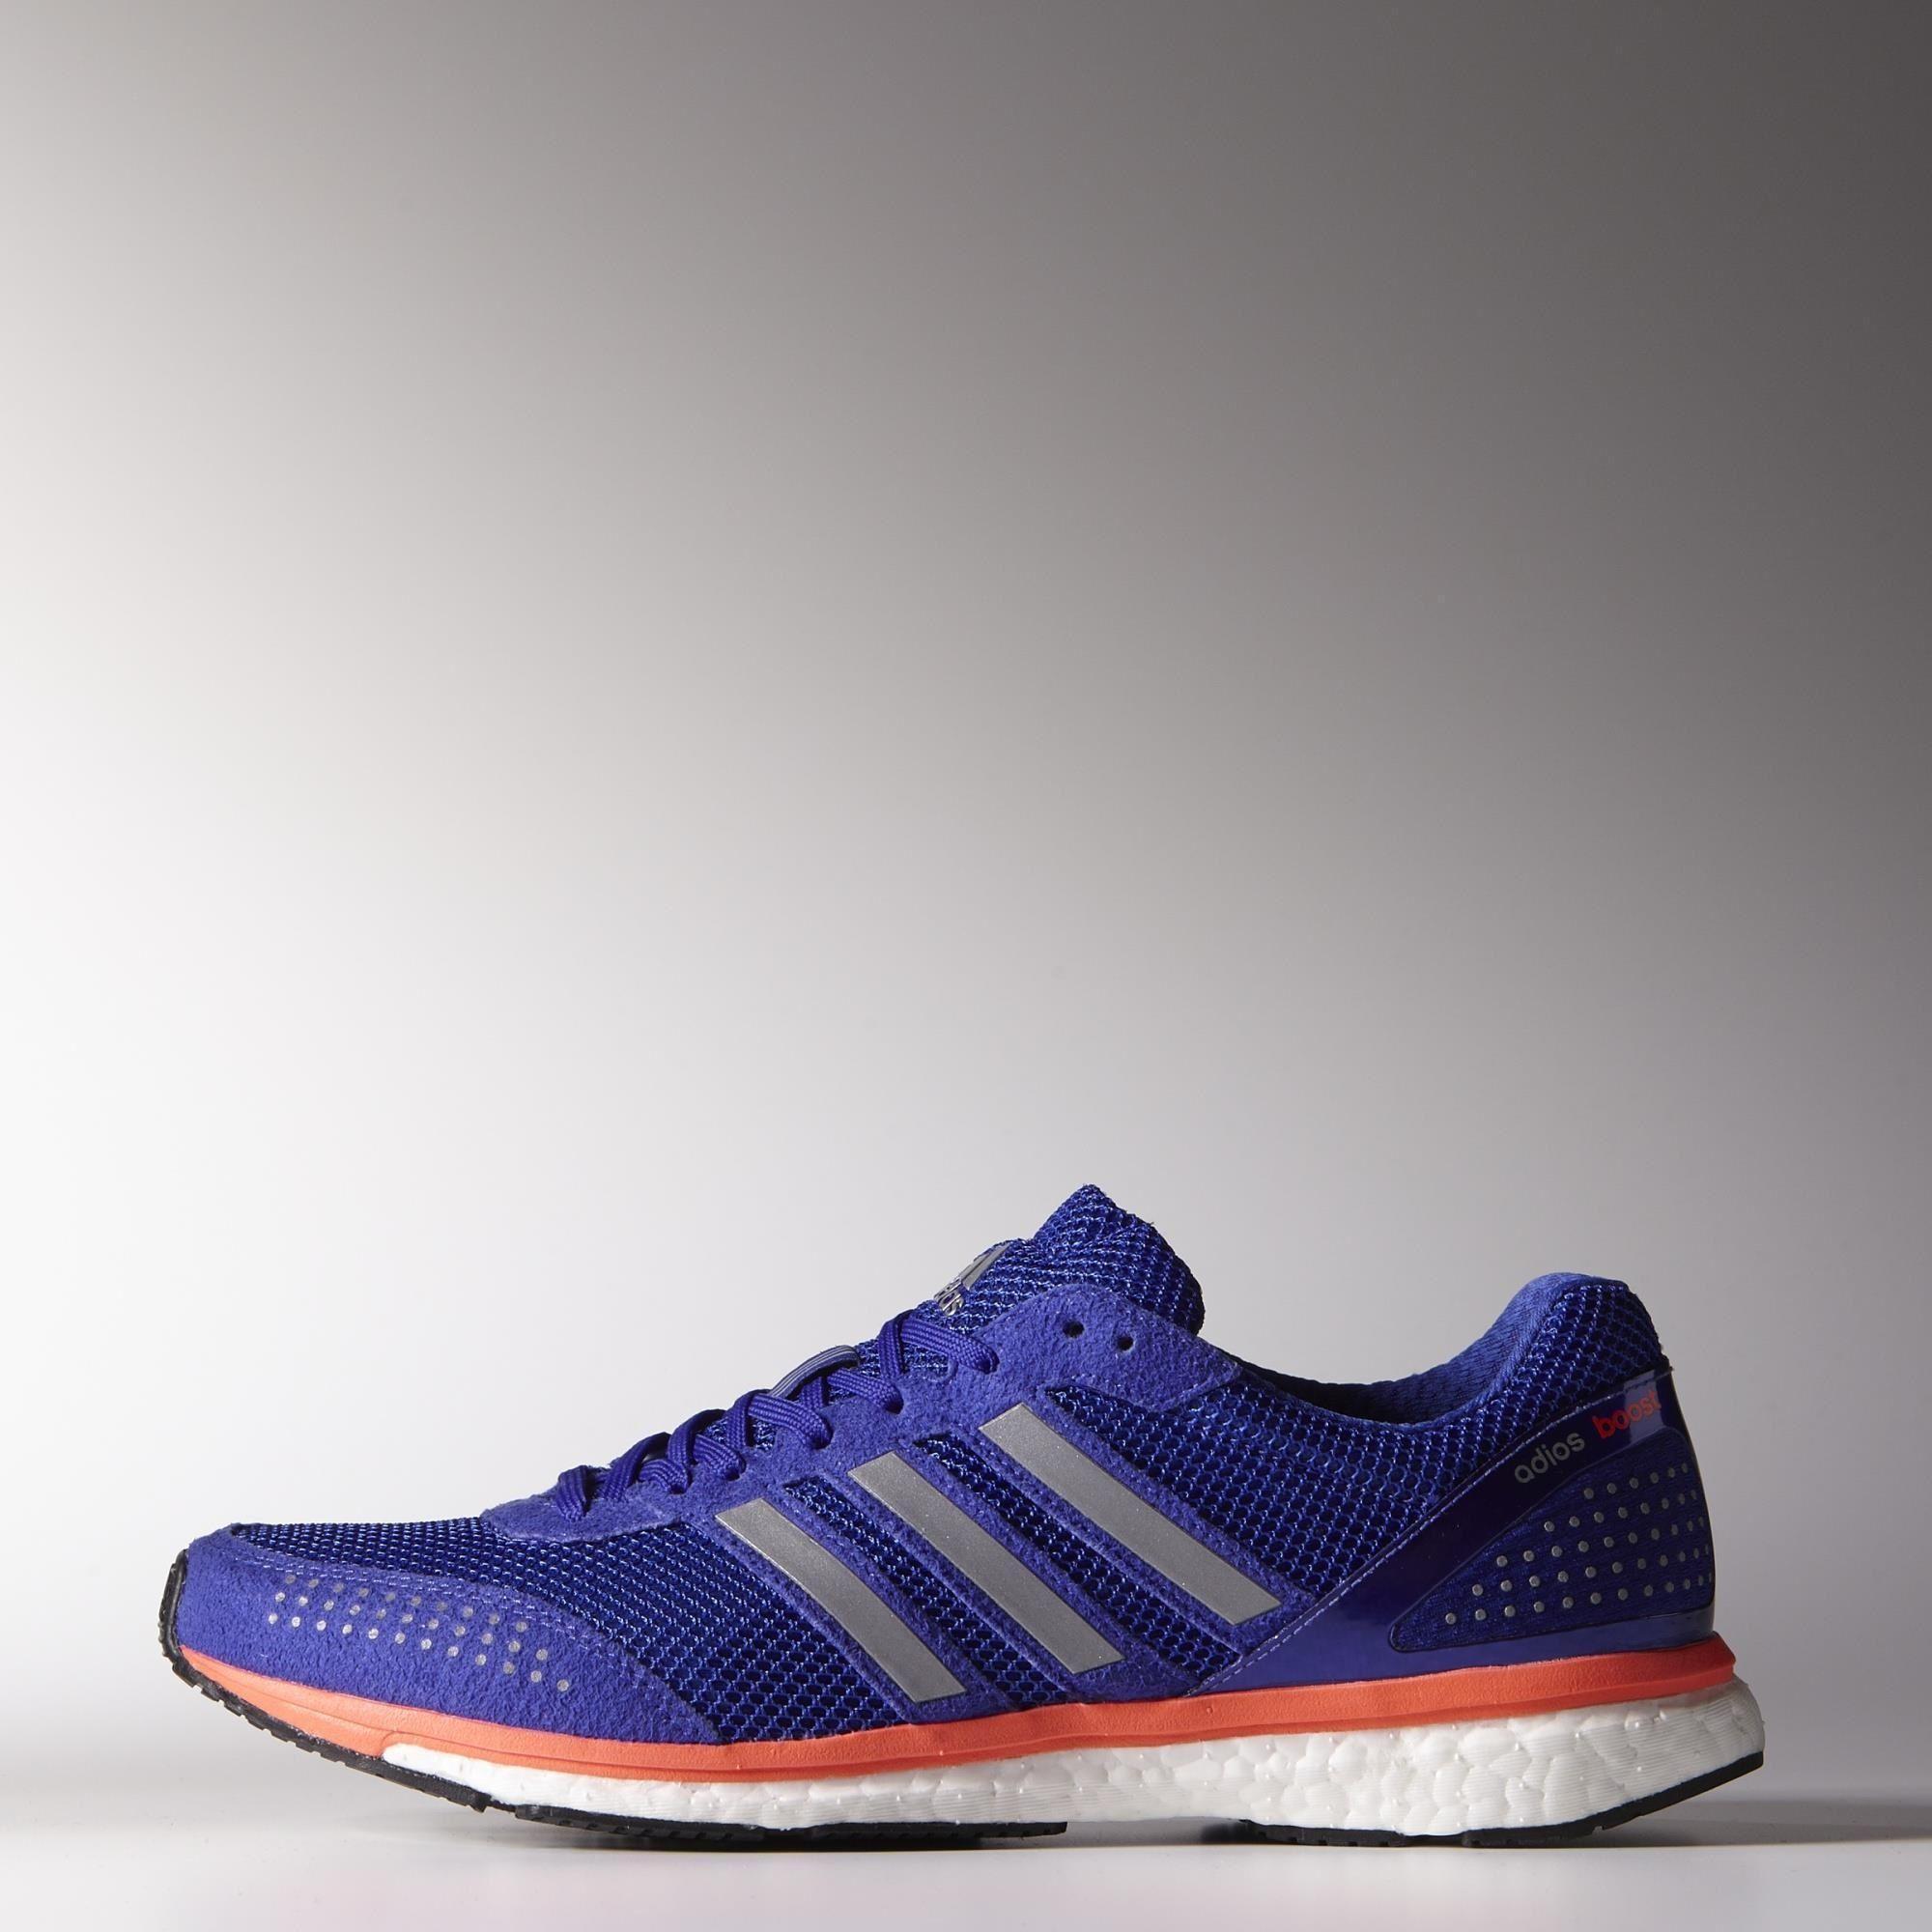 adidas mens adizero adios boost 2 0 running shoes night flash orange. Black Bedroom Furniture Sets. Home Design Ideas